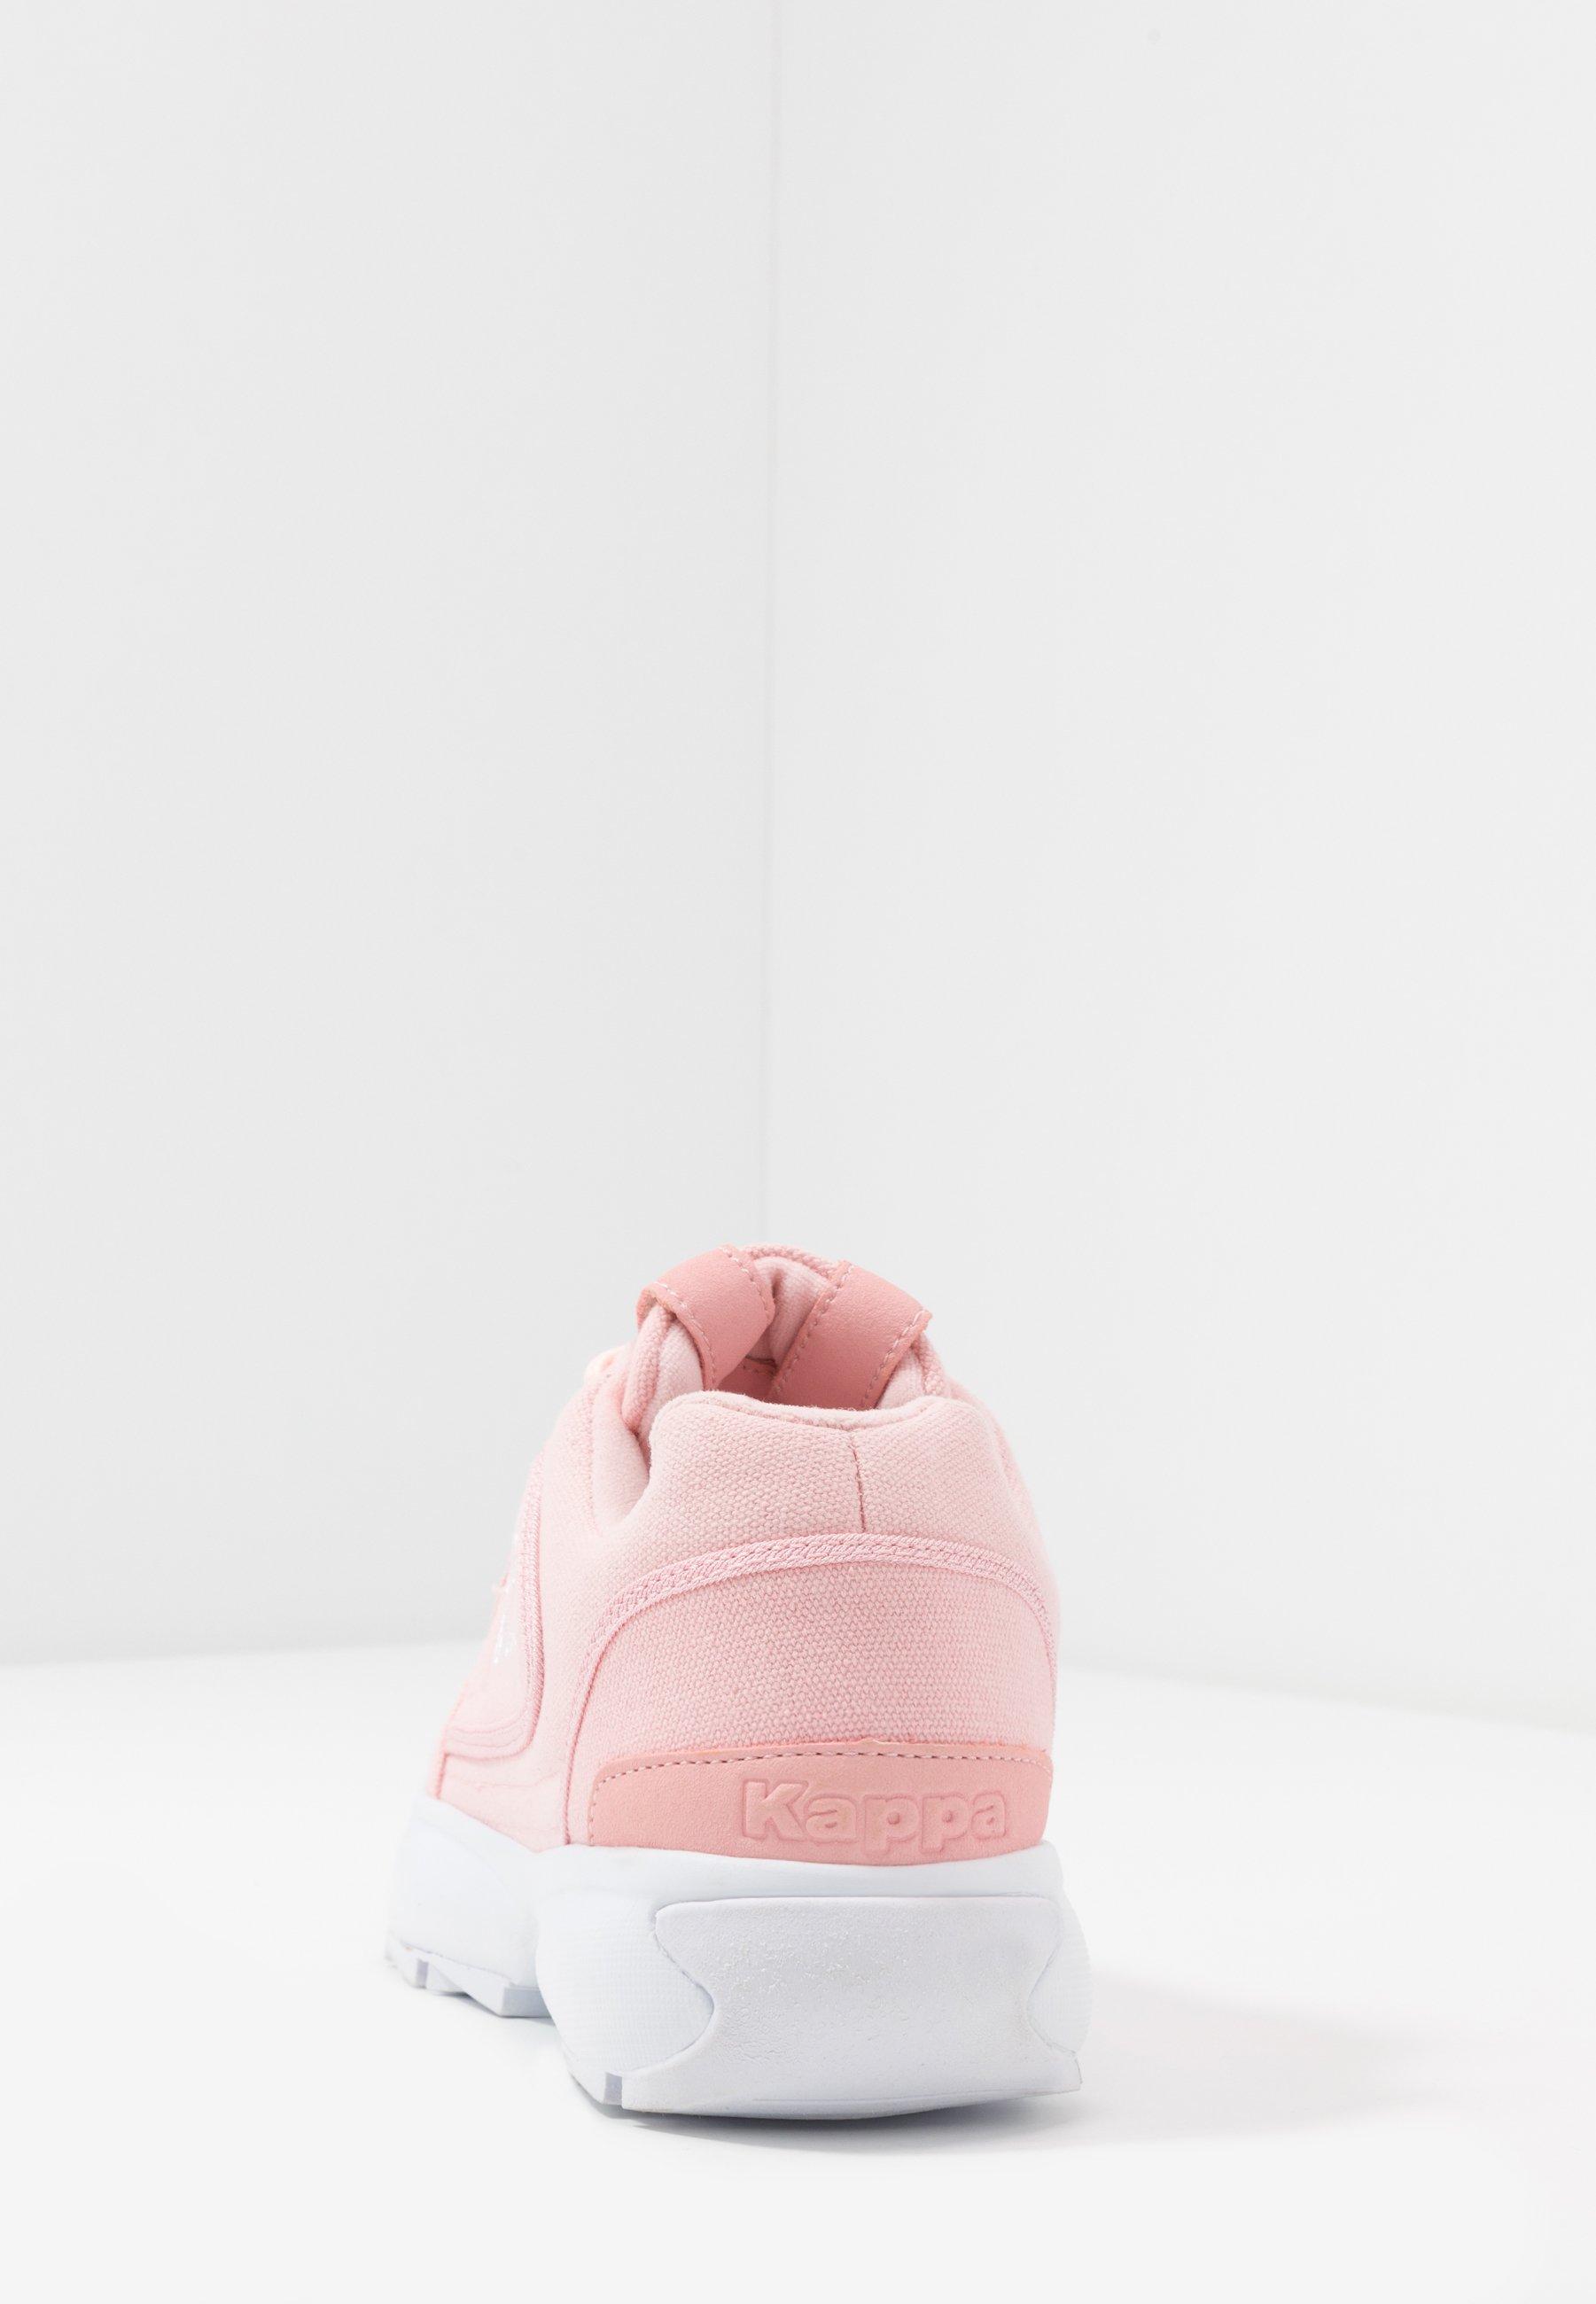 Kappa RAVE SUN - Scarpe da fitness - rosé/white fKK5usrl